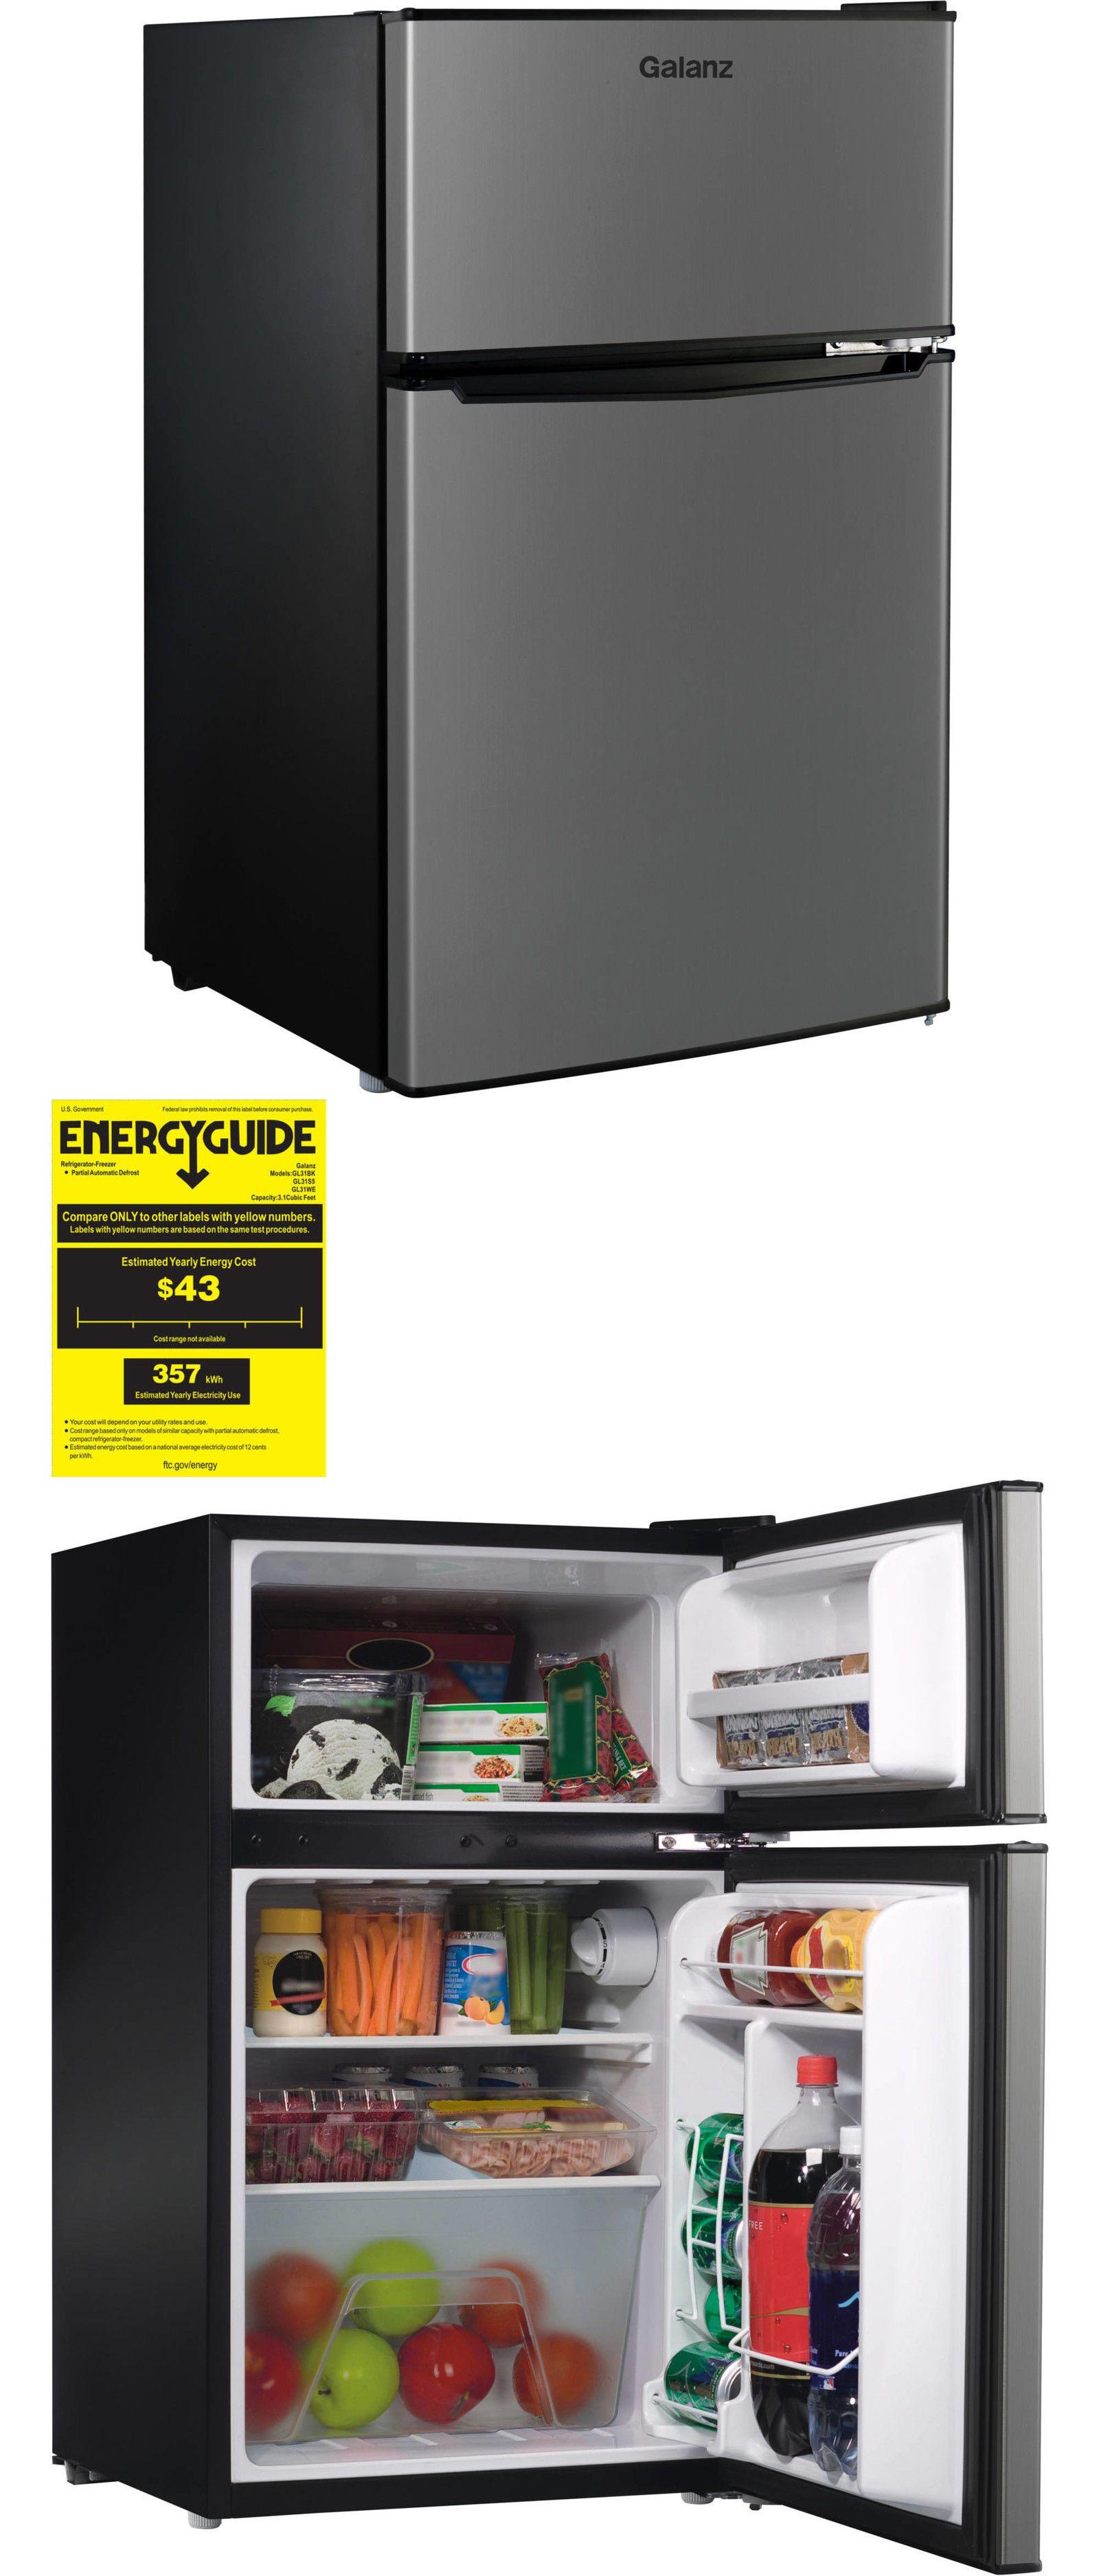 Mini Fridges 71262 Compact Dorm Small Fridge Refrigerator 3 1 Cu Ft Office Double Door